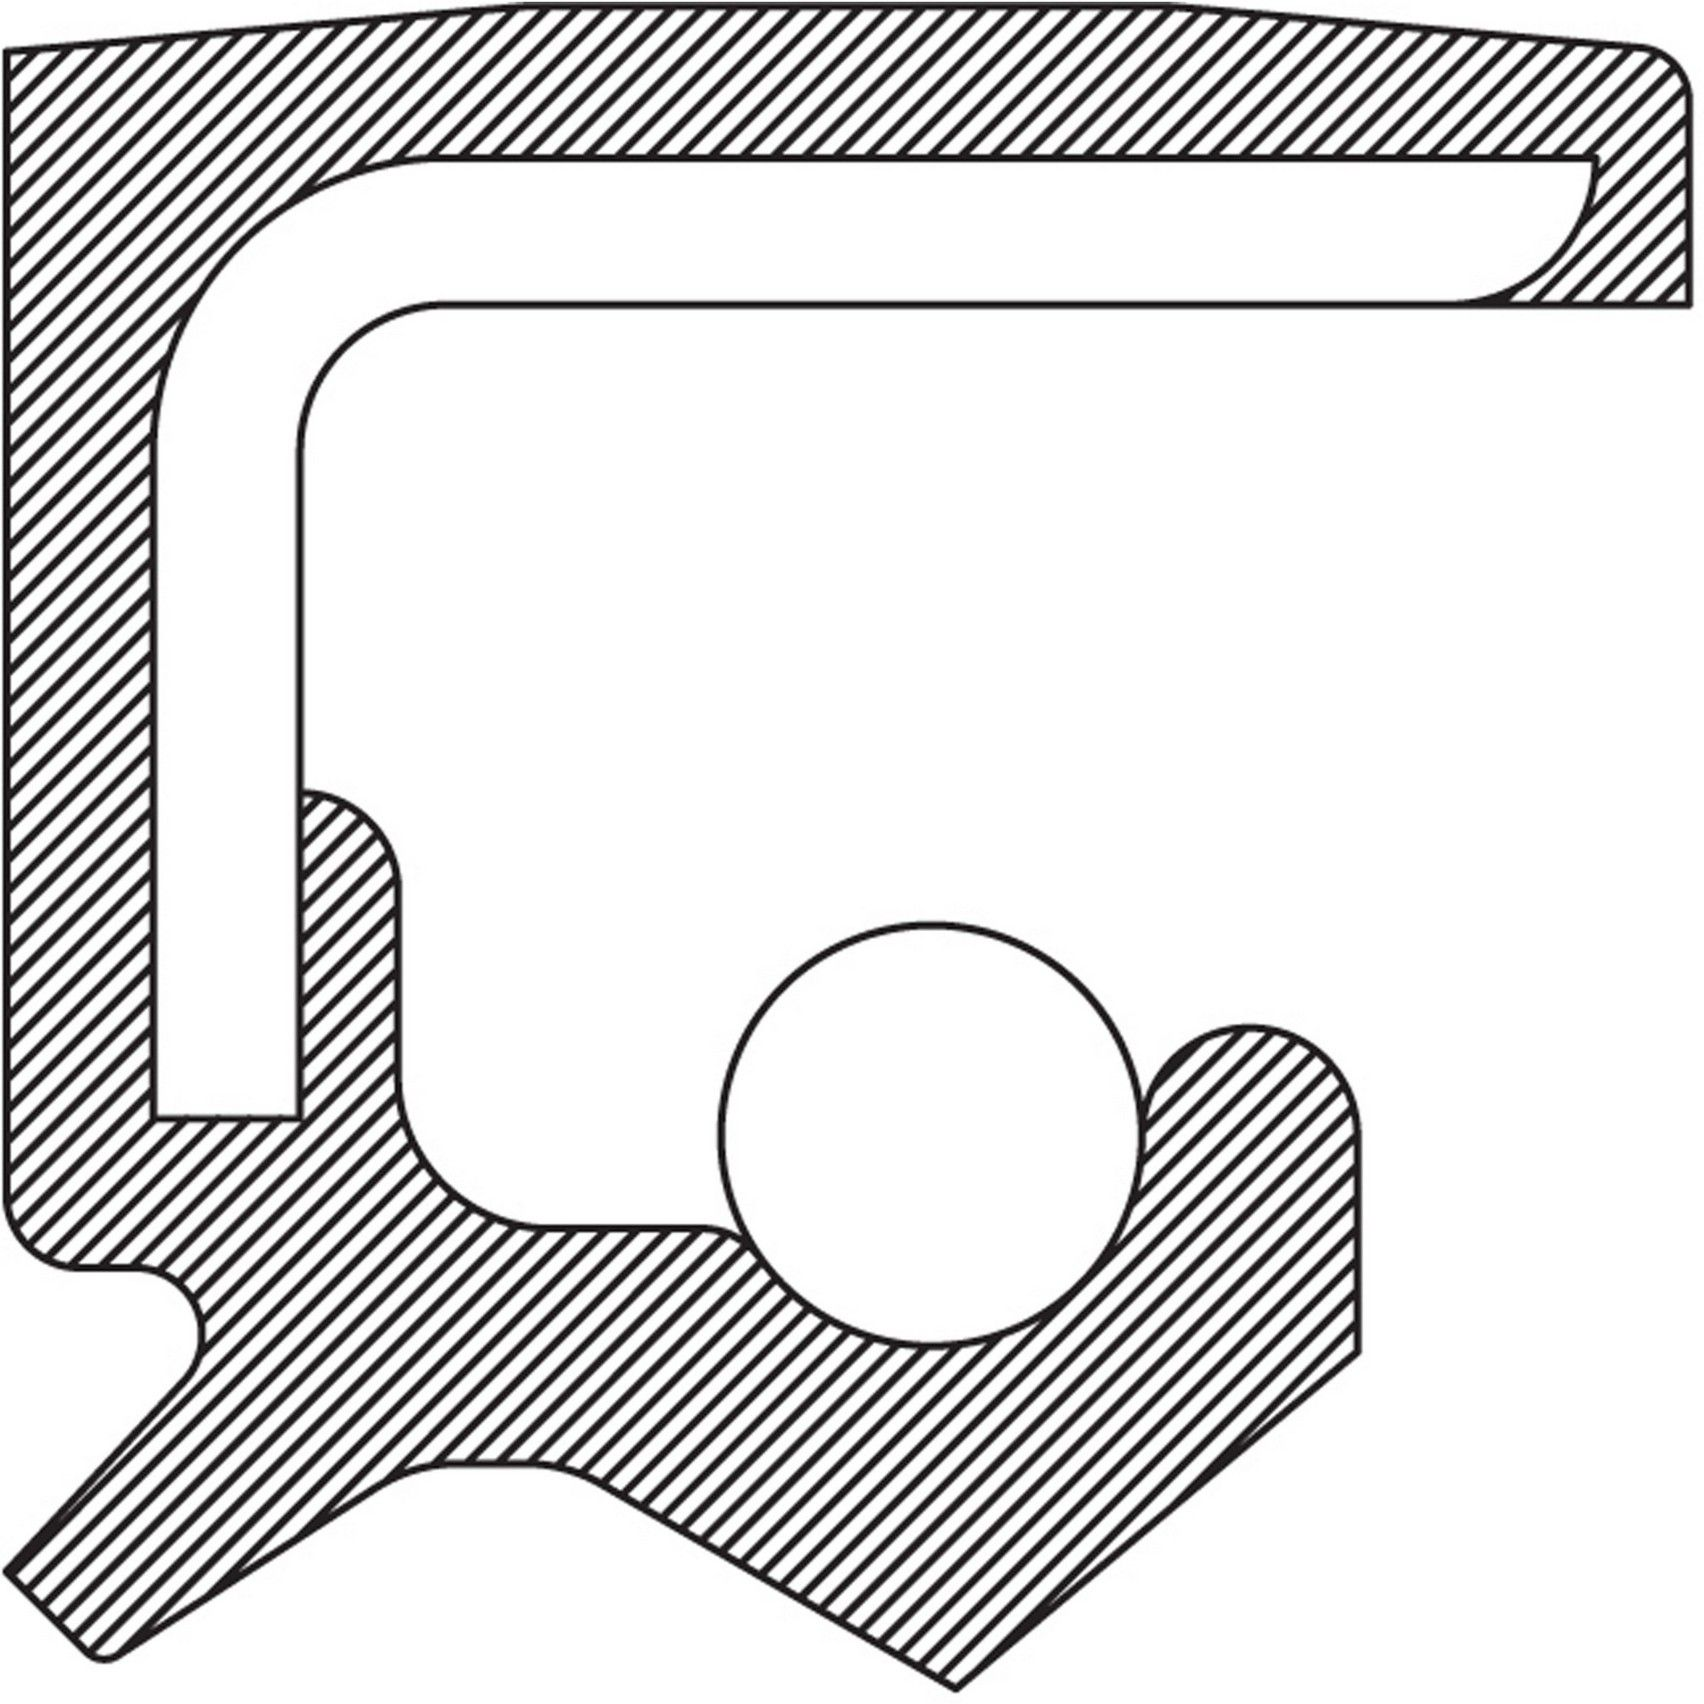 2003 f150 transfer case seal